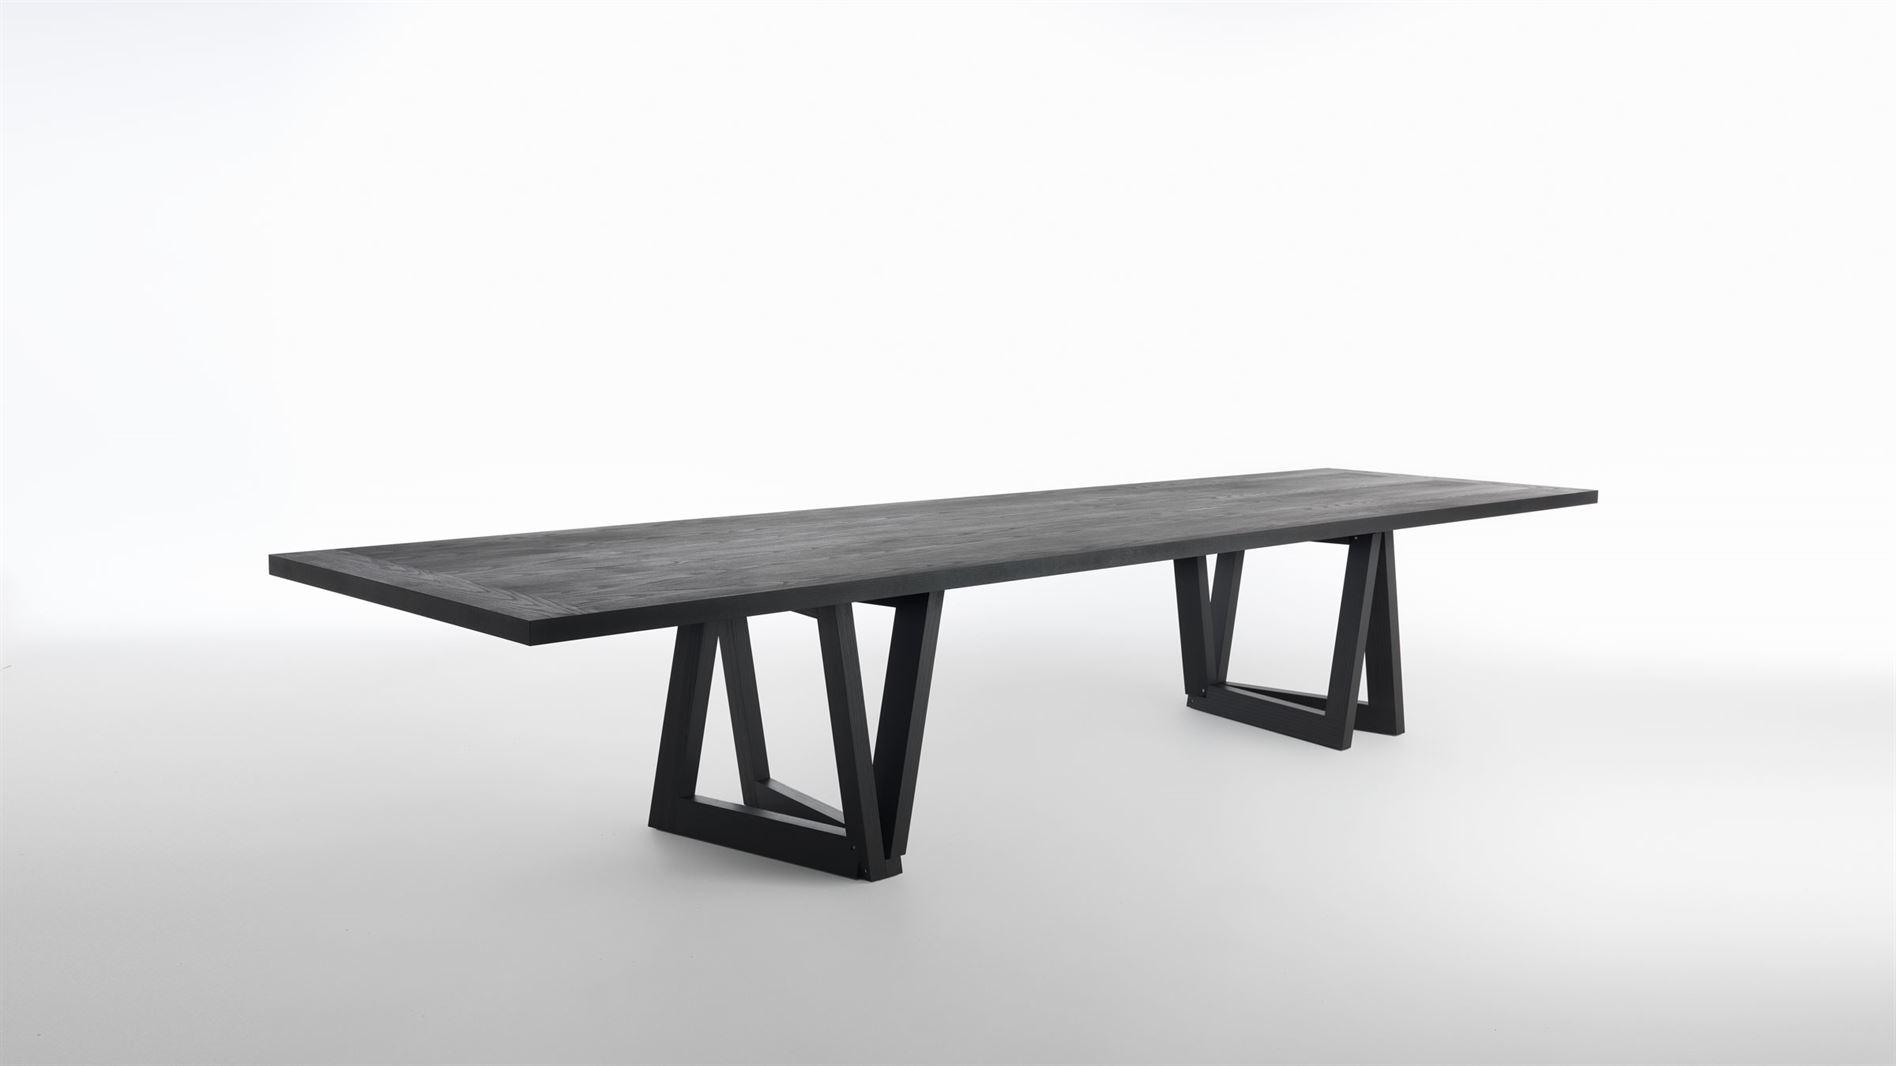 dror-long-table_0036